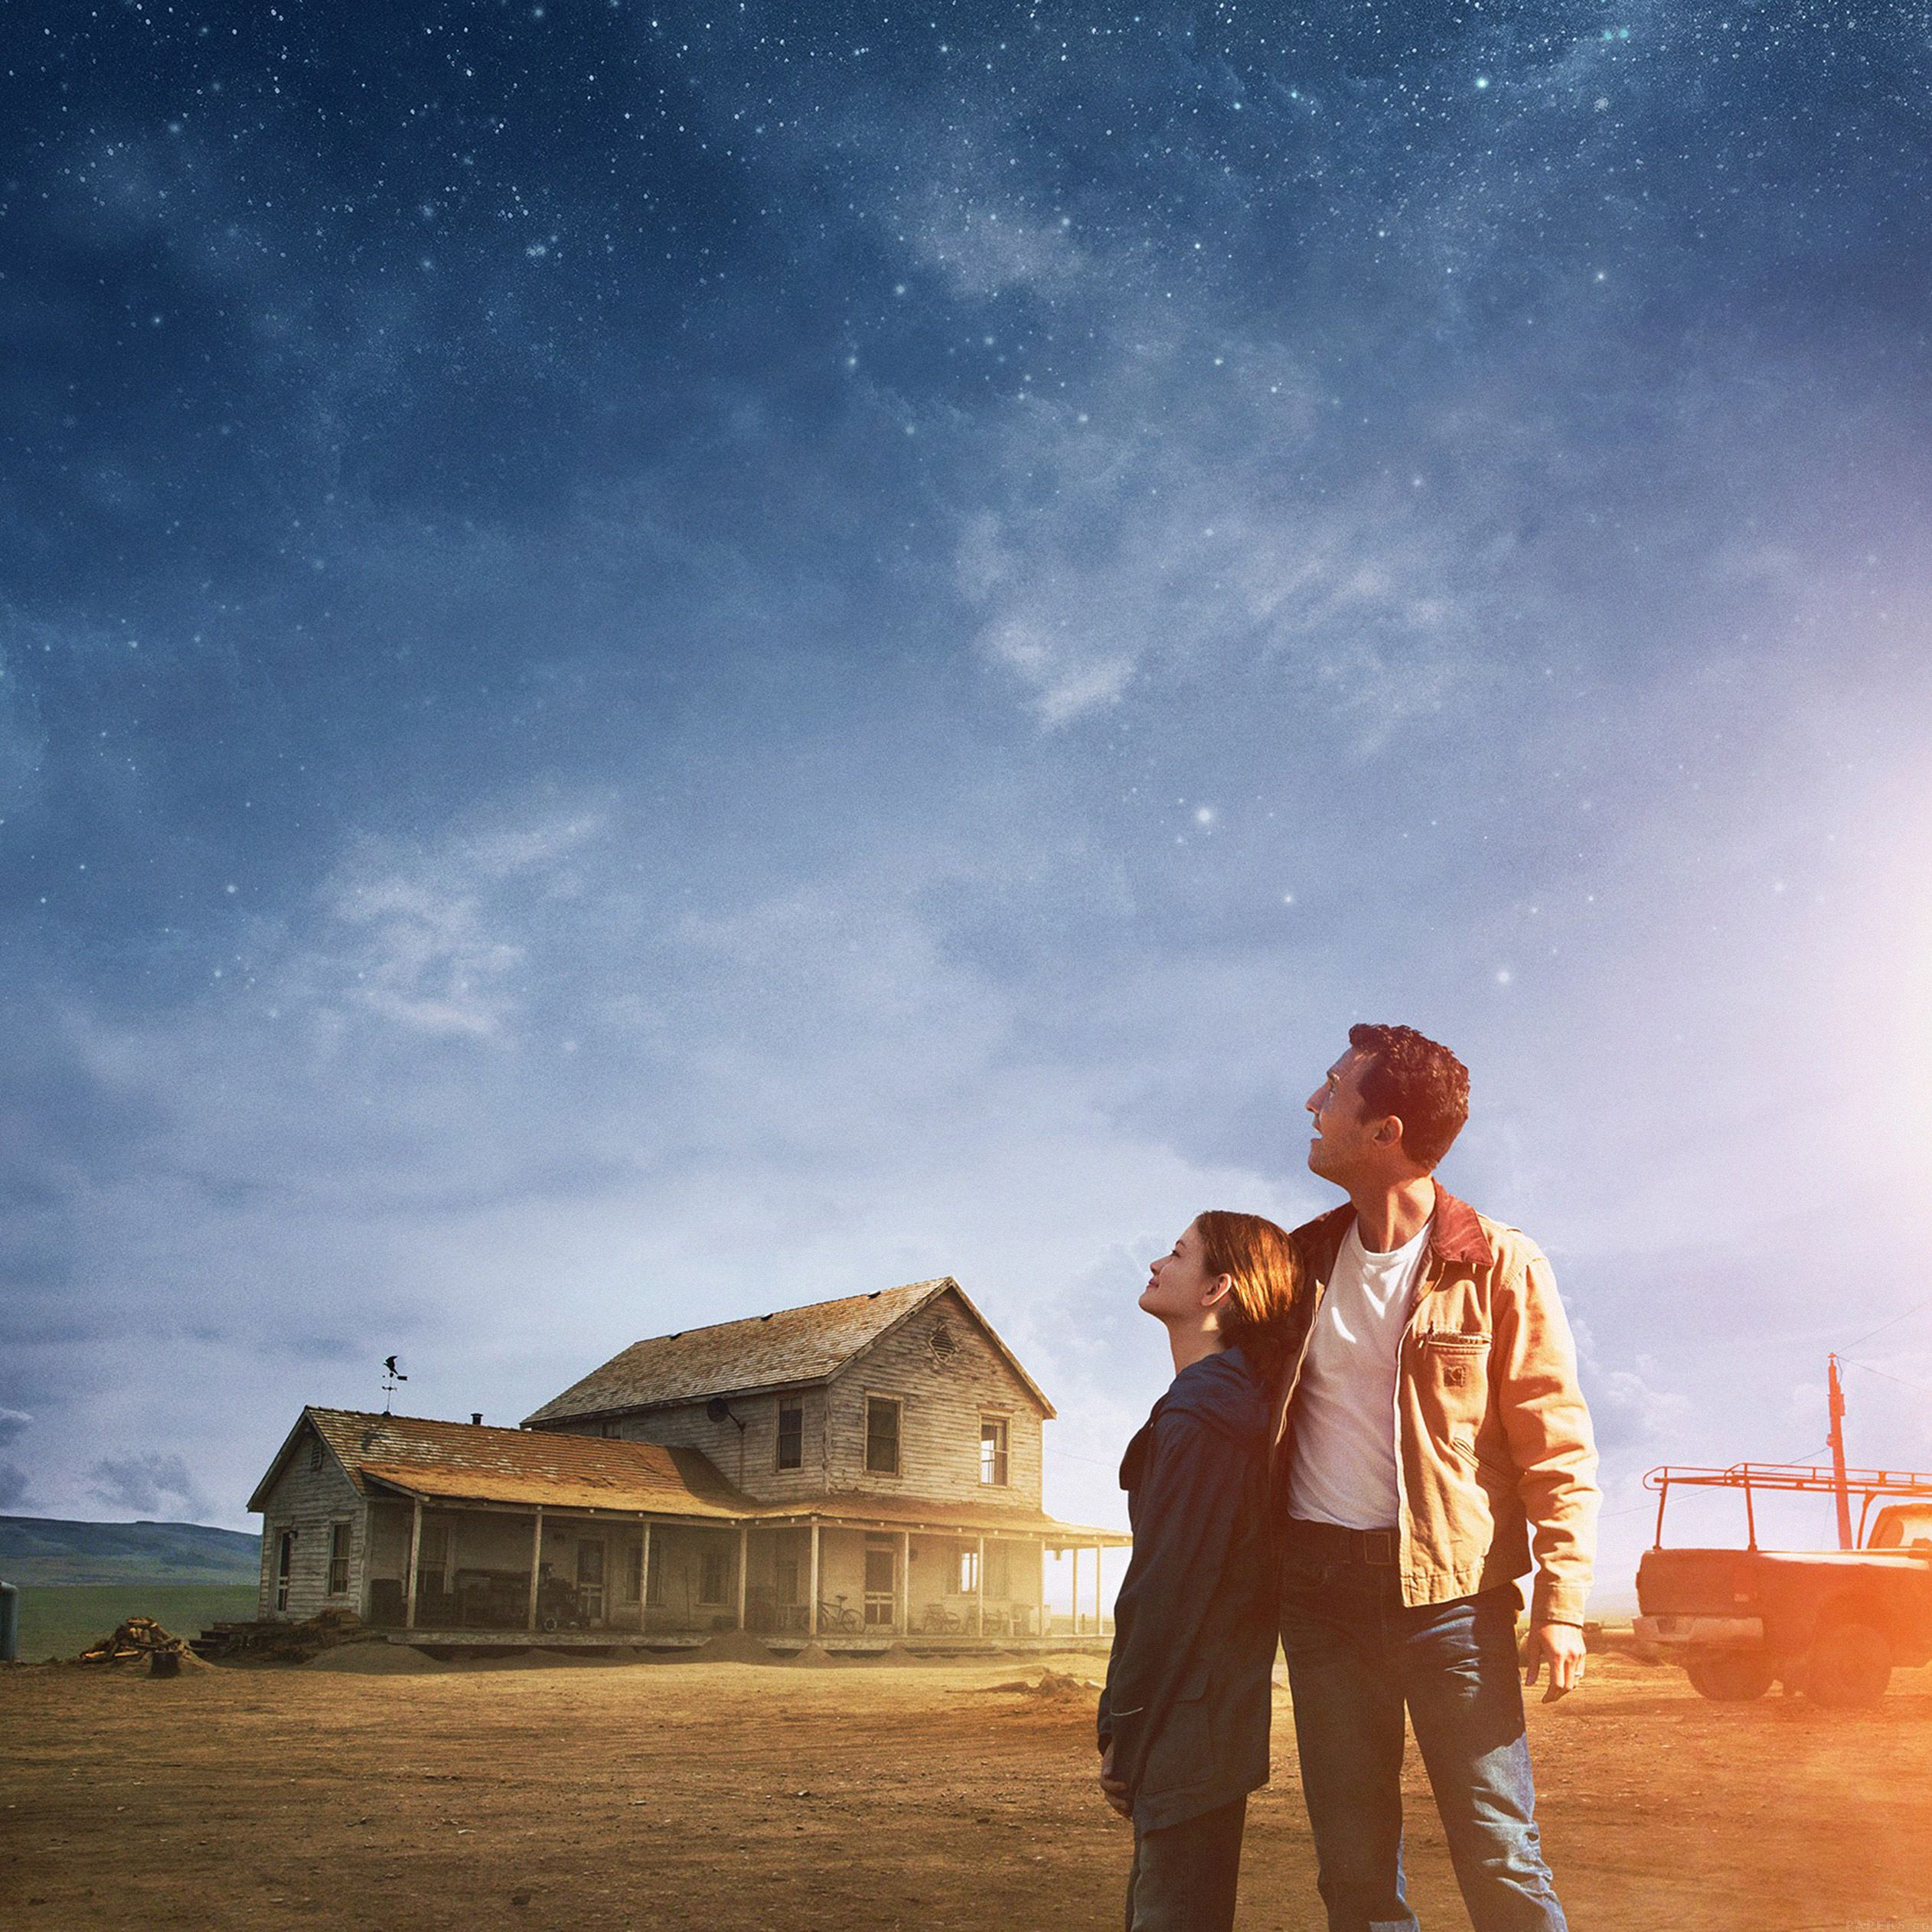 Interstellar Movie Wallpaper HD Wallpapers Pinterest - Beautifully designed interstellar posters james fletcher